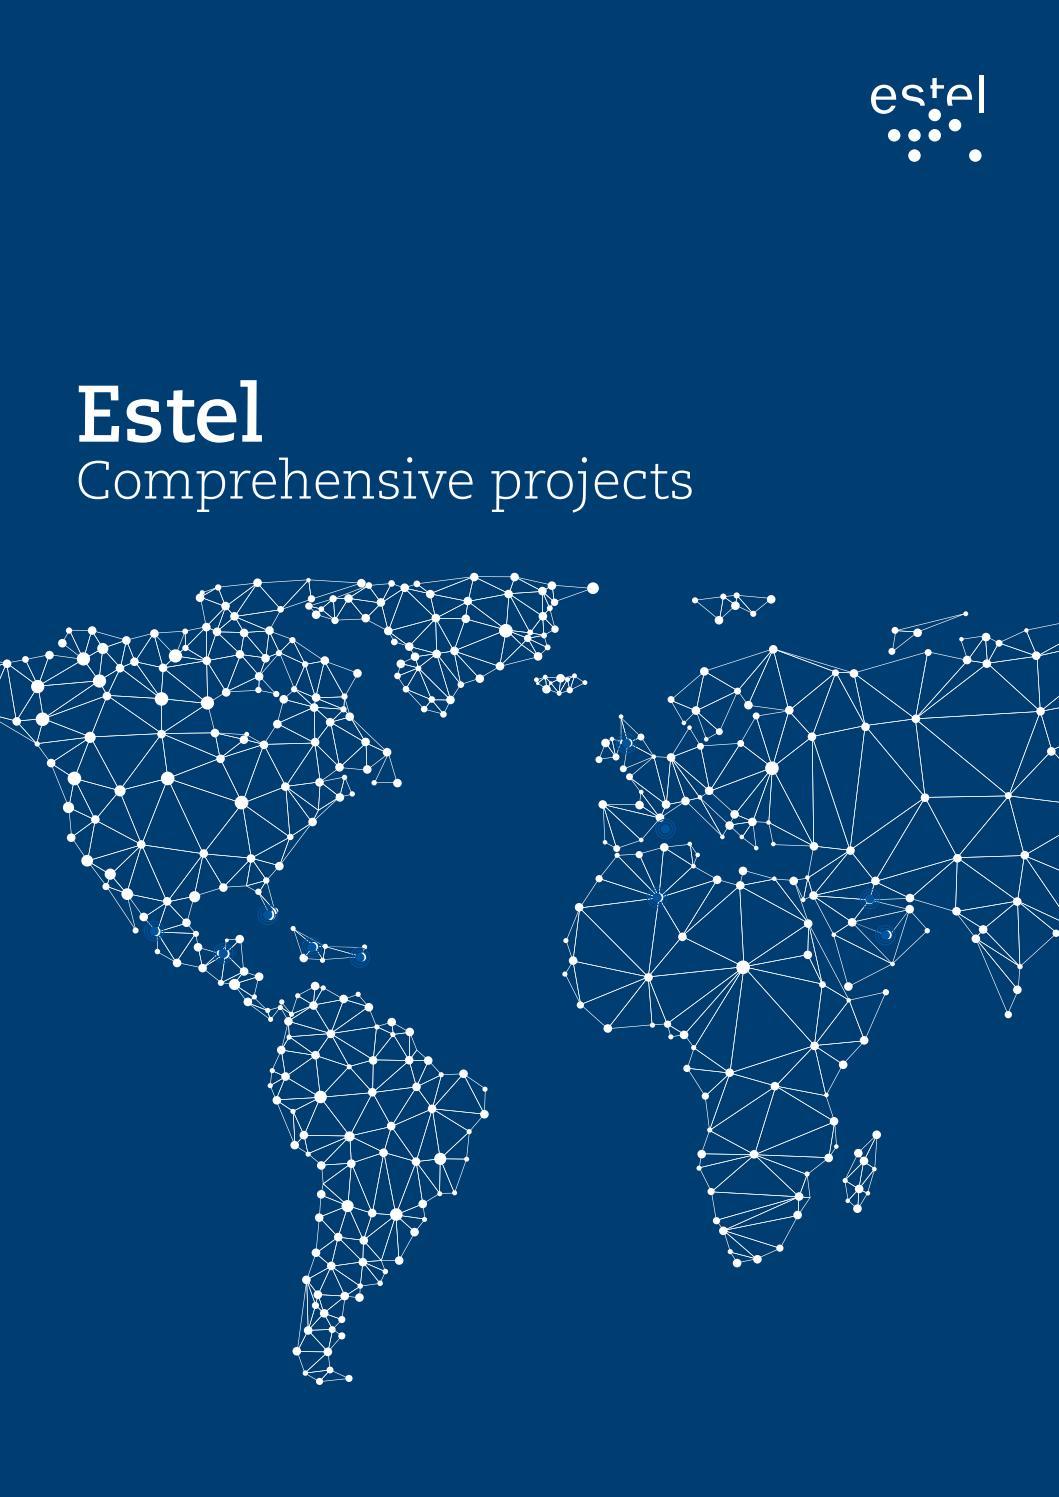 Brochure estel 2016 en by Iberostar - issuu